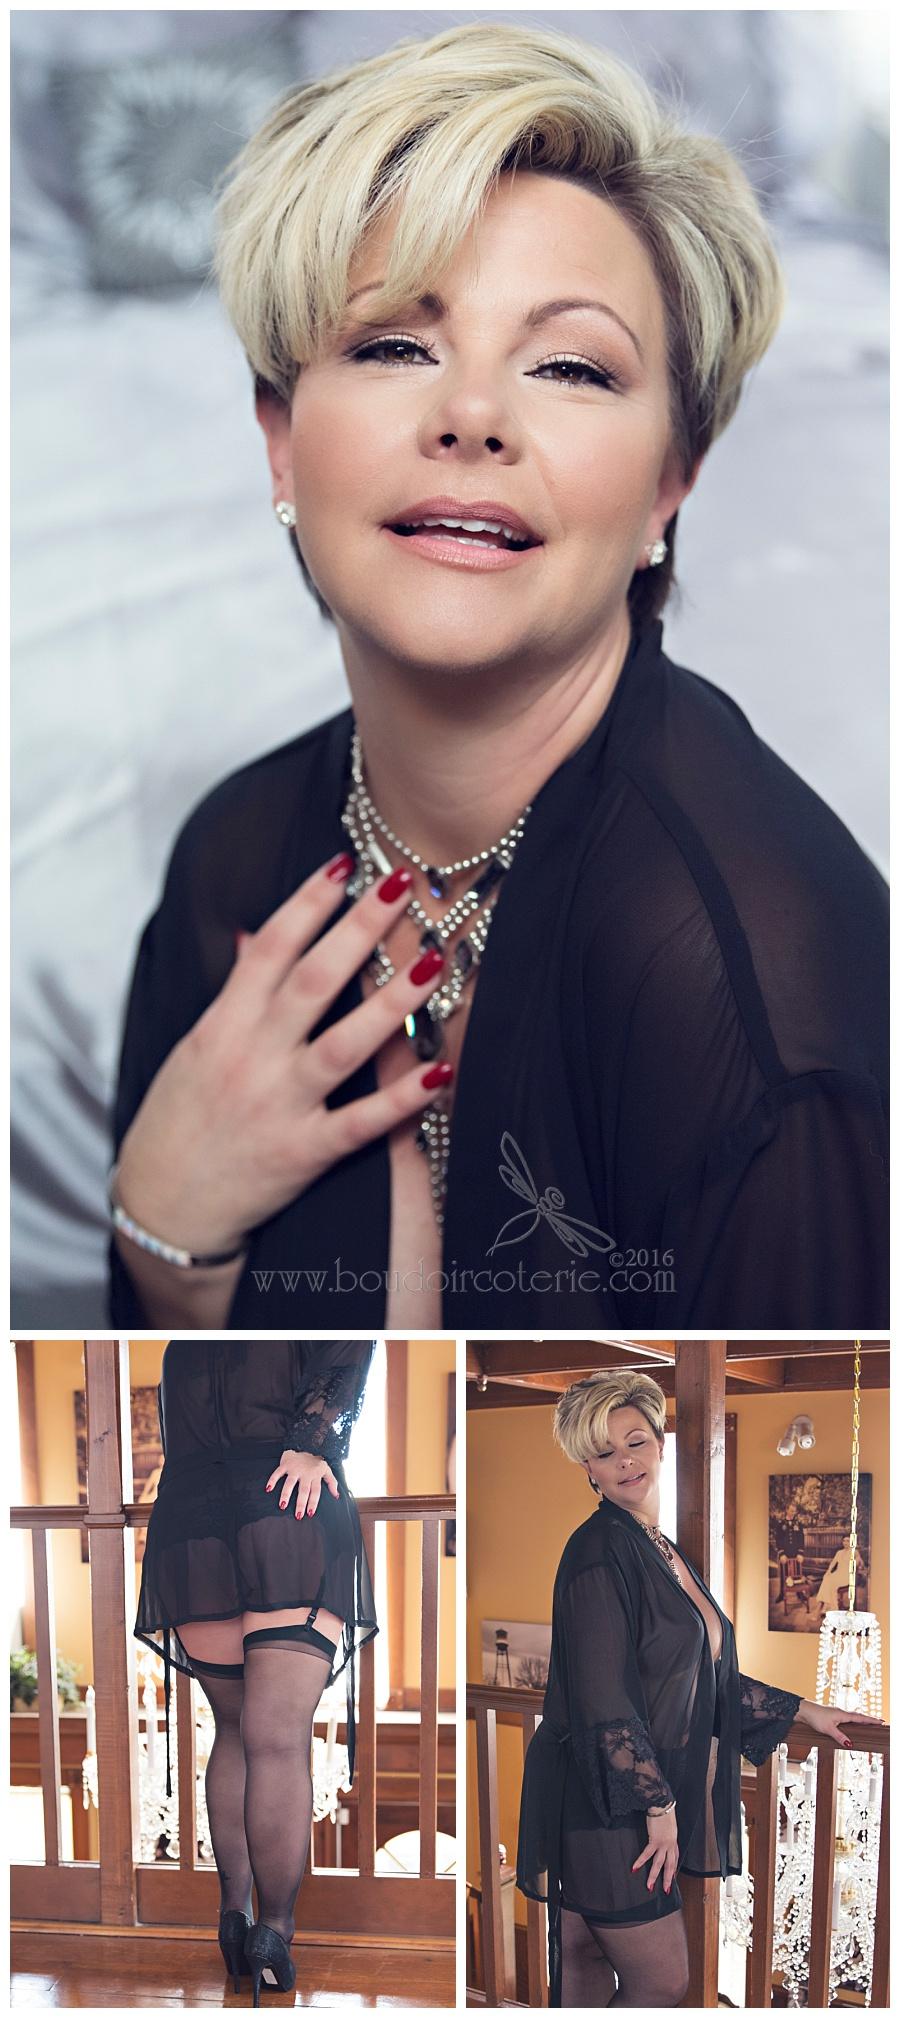 Boudour Coterie Beauty Glamour Lingerie Photography_0143.jpg